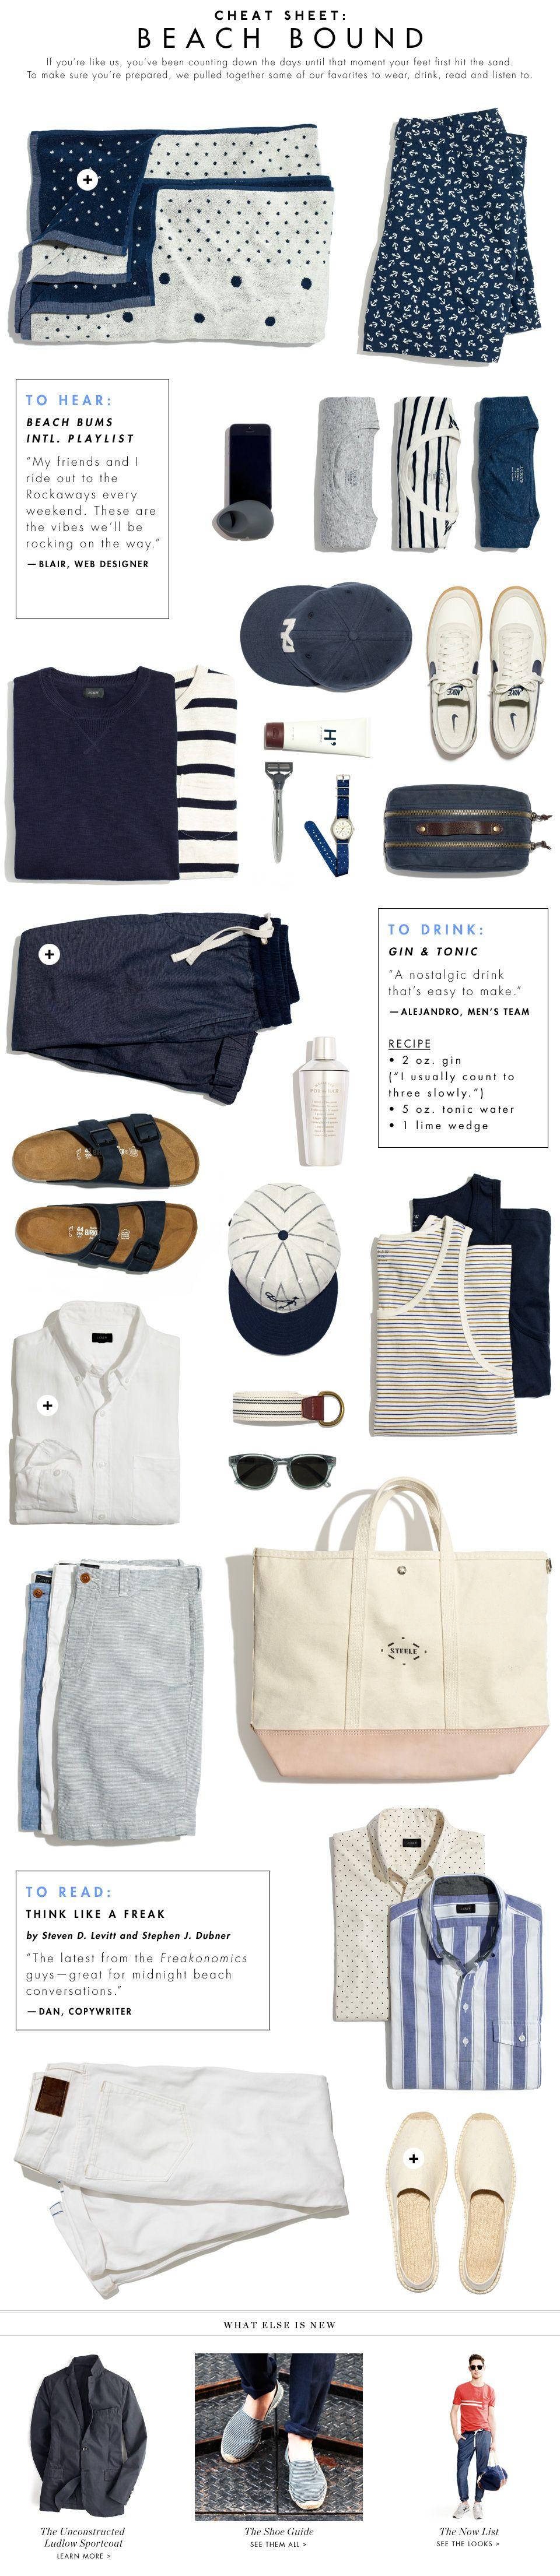 Mens Cotton Pocket Square - Him wear by VIDA VIDA 6zXAT